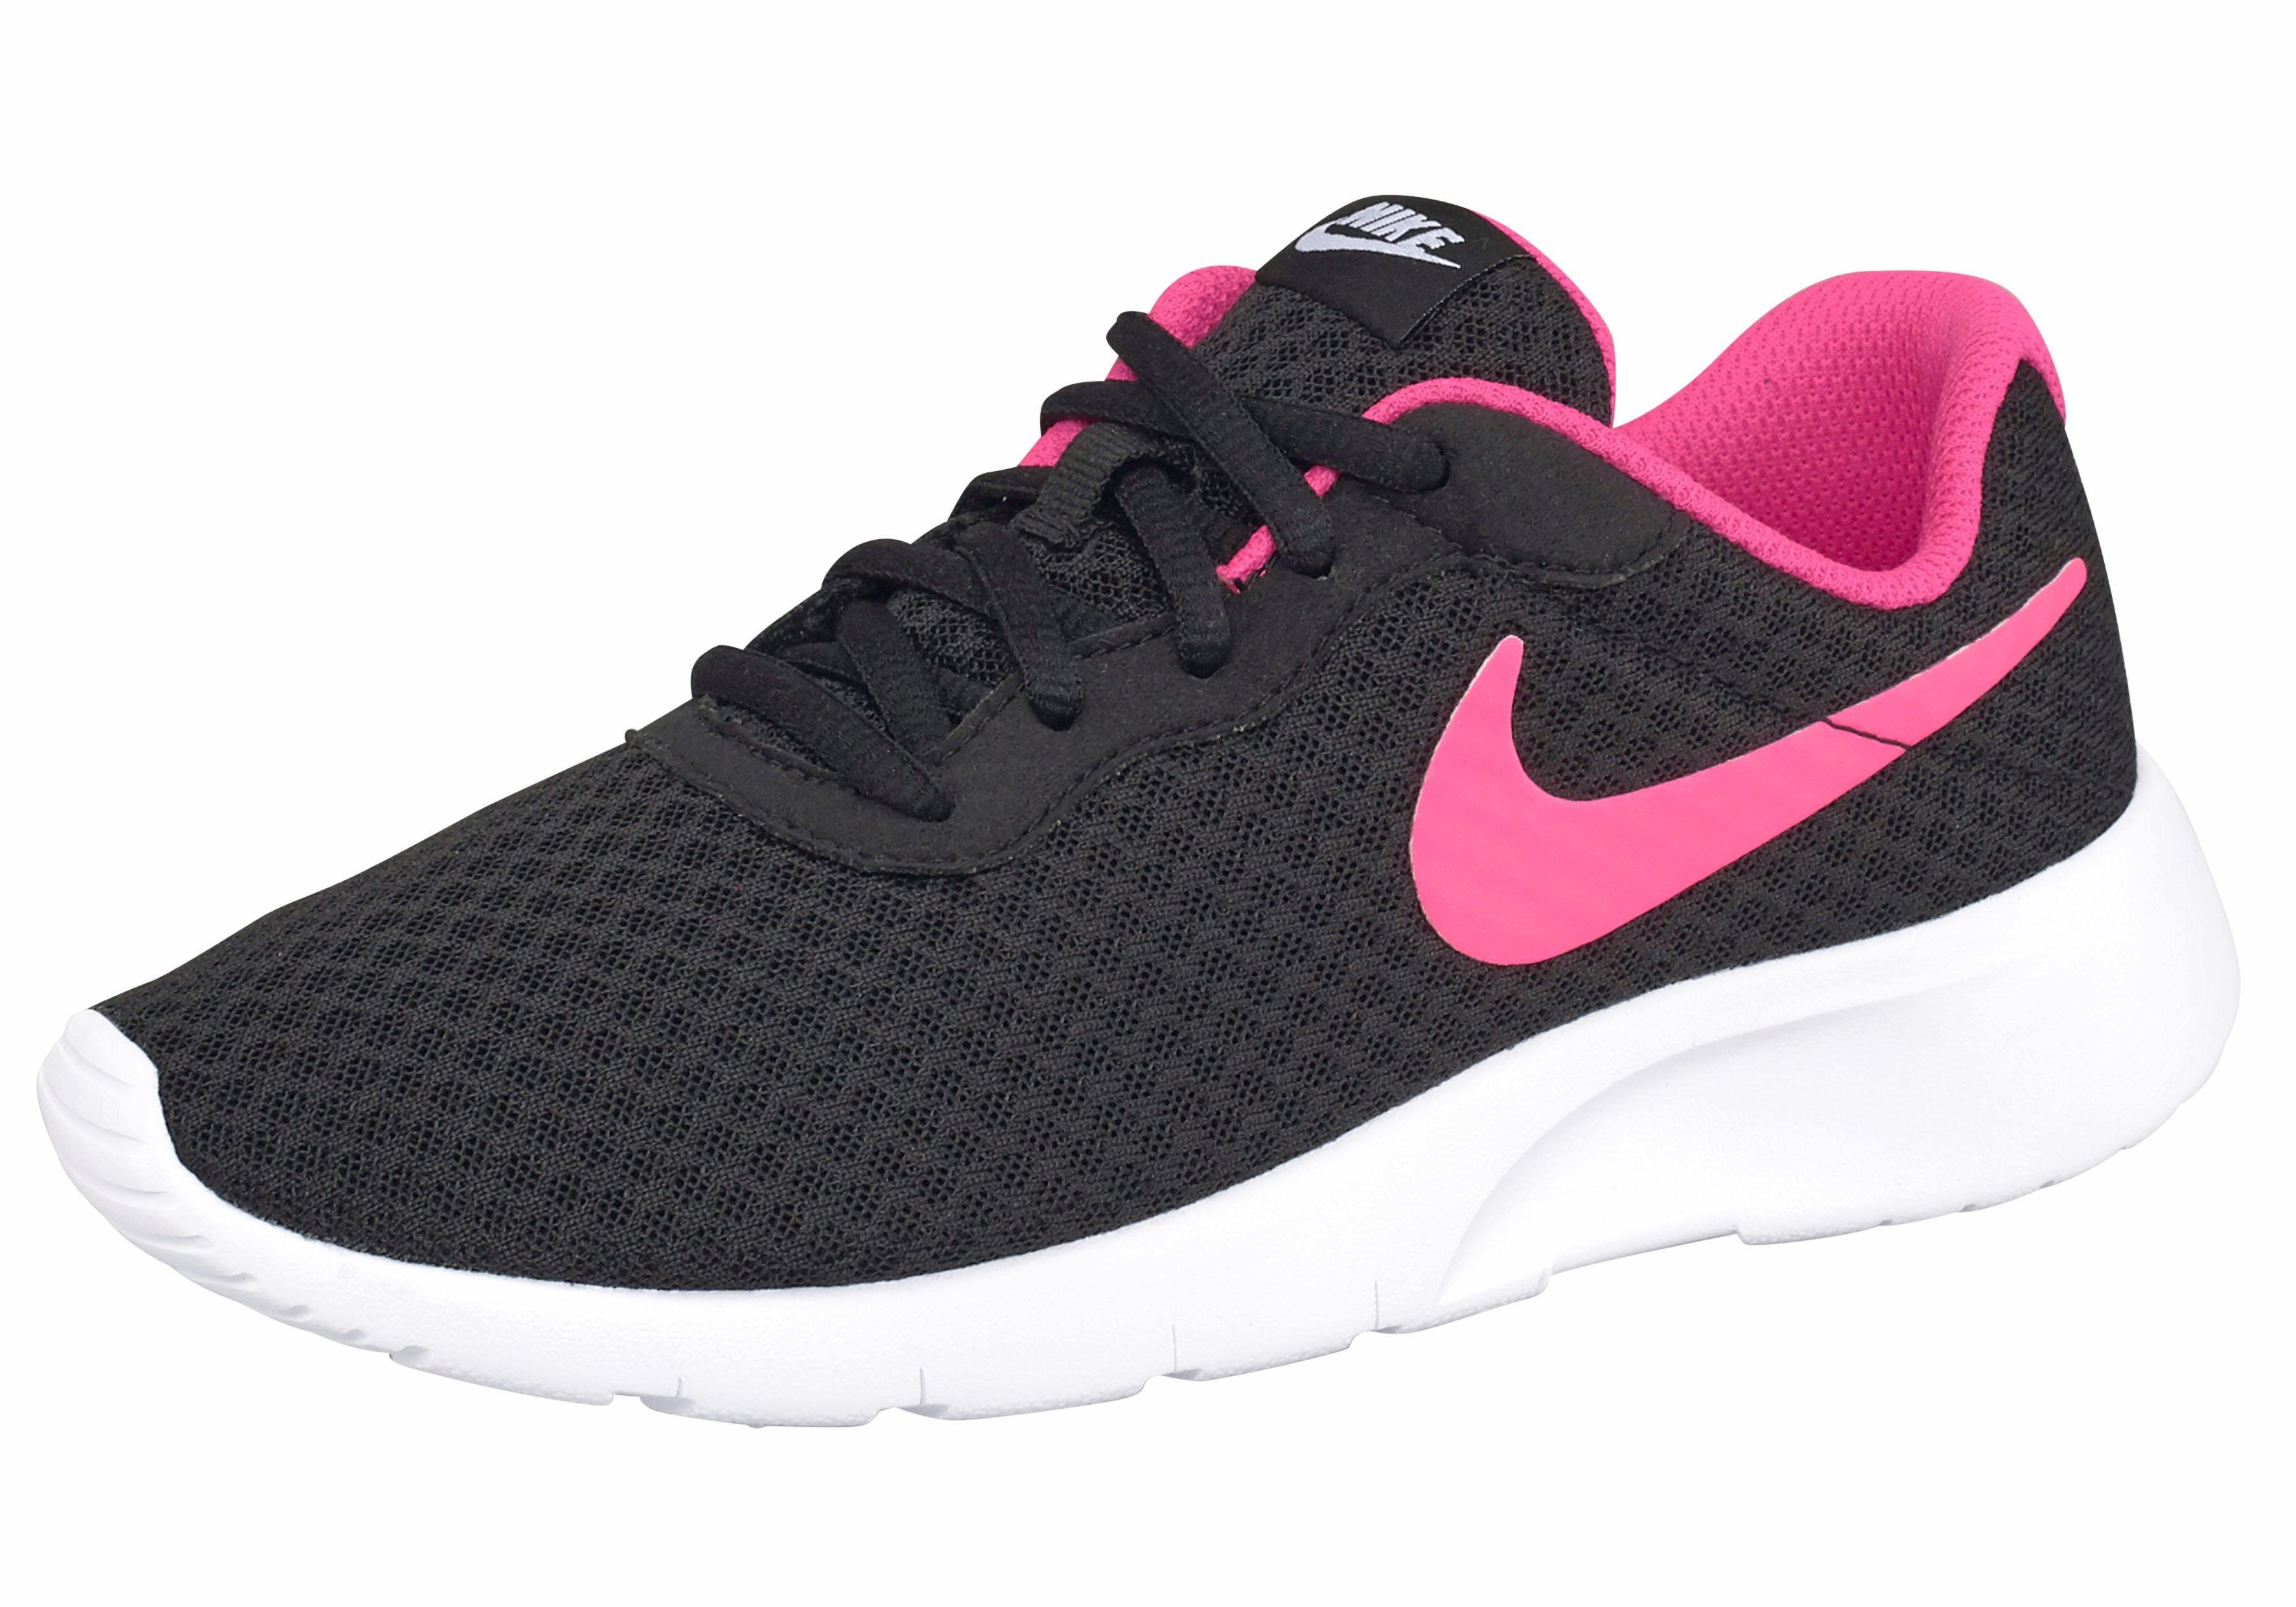 Nike Sportswear »Tanjun« Sneaker, Leichter Sneaker von Nike online kaufen | OTTO